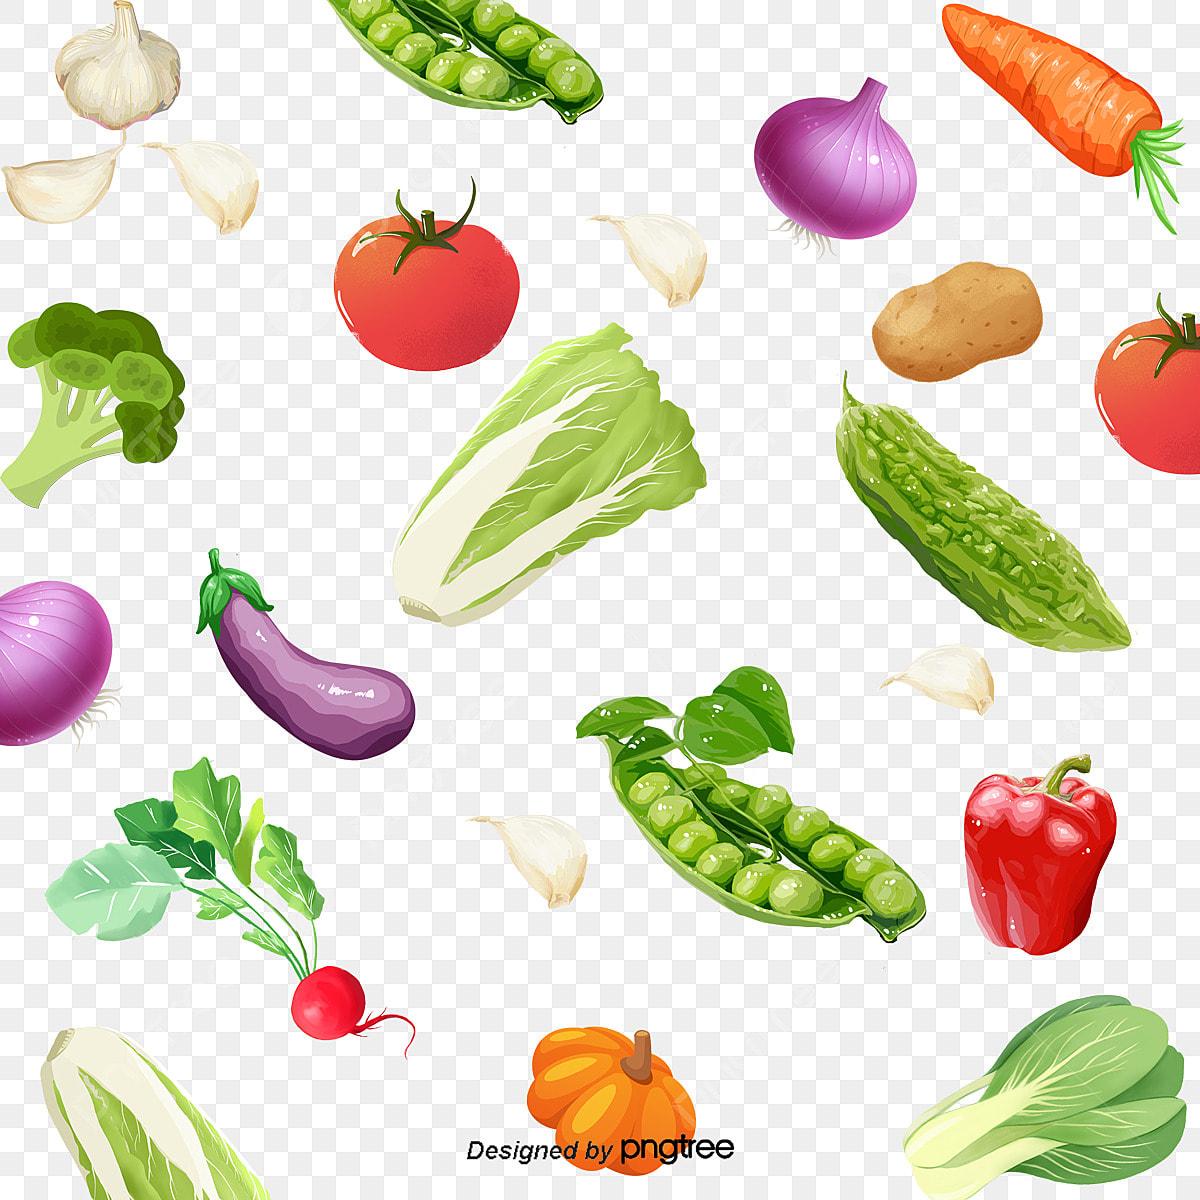 Sayur Sayuran Campur Aduk, Hiasan, Vektor, Semua Jenis Sayur